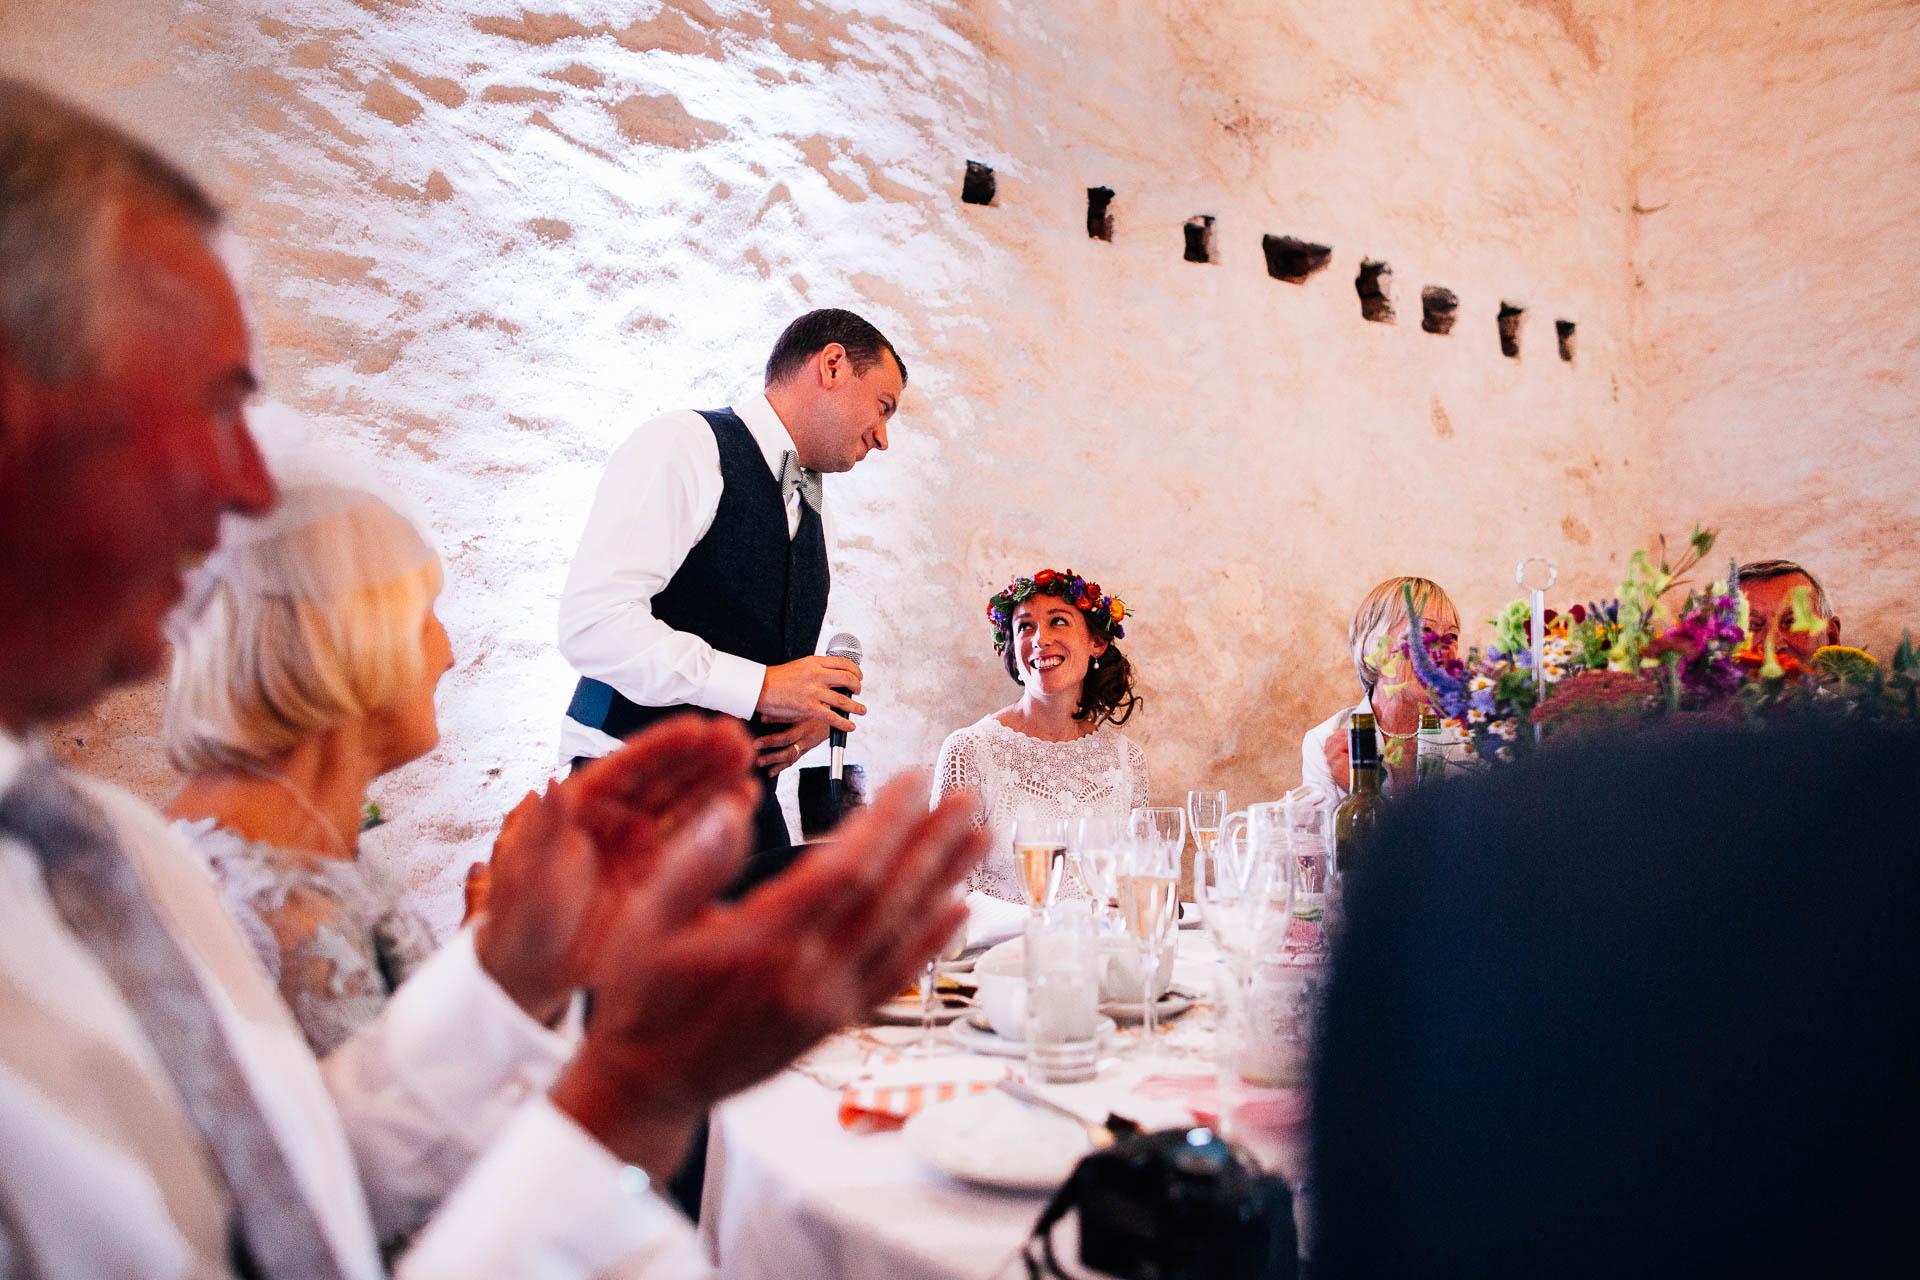 winterbourne-medieval-barn-wedding-photography-emma-andrew-105